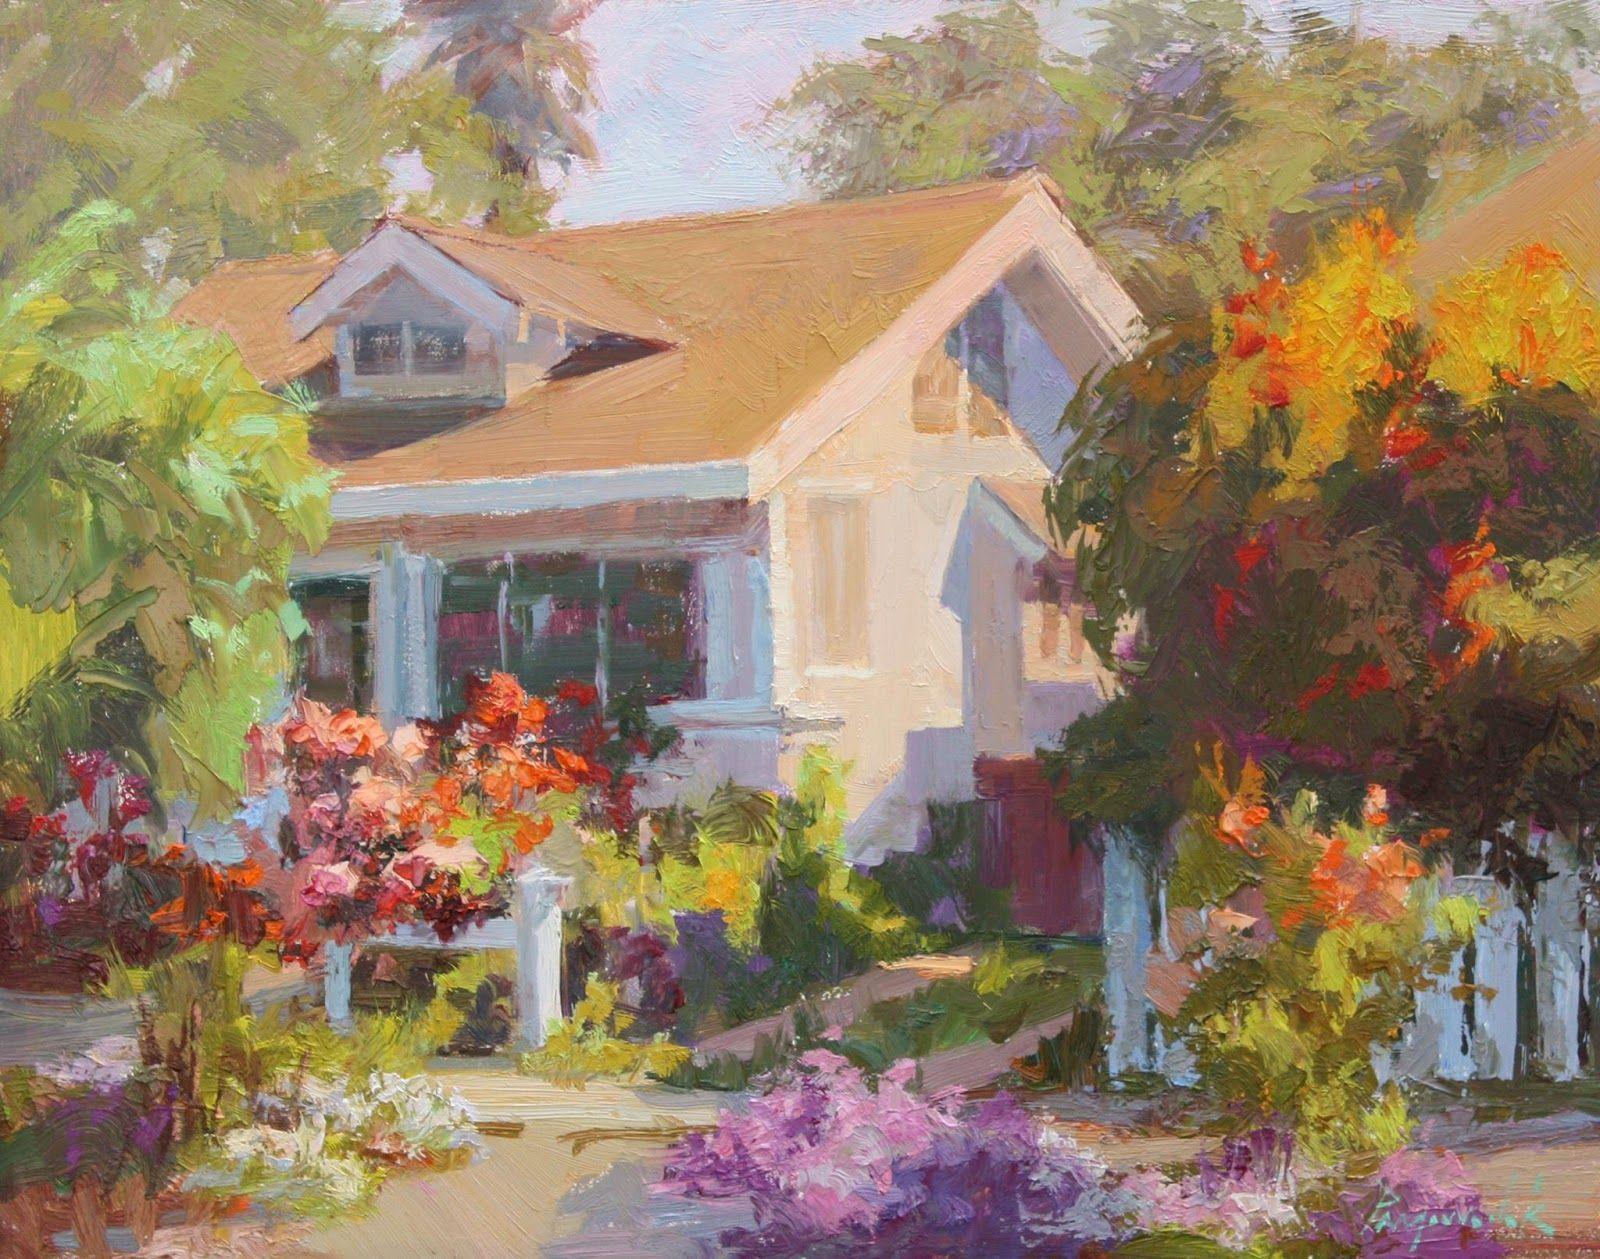 Camille przewodek plein air colorist painter oil